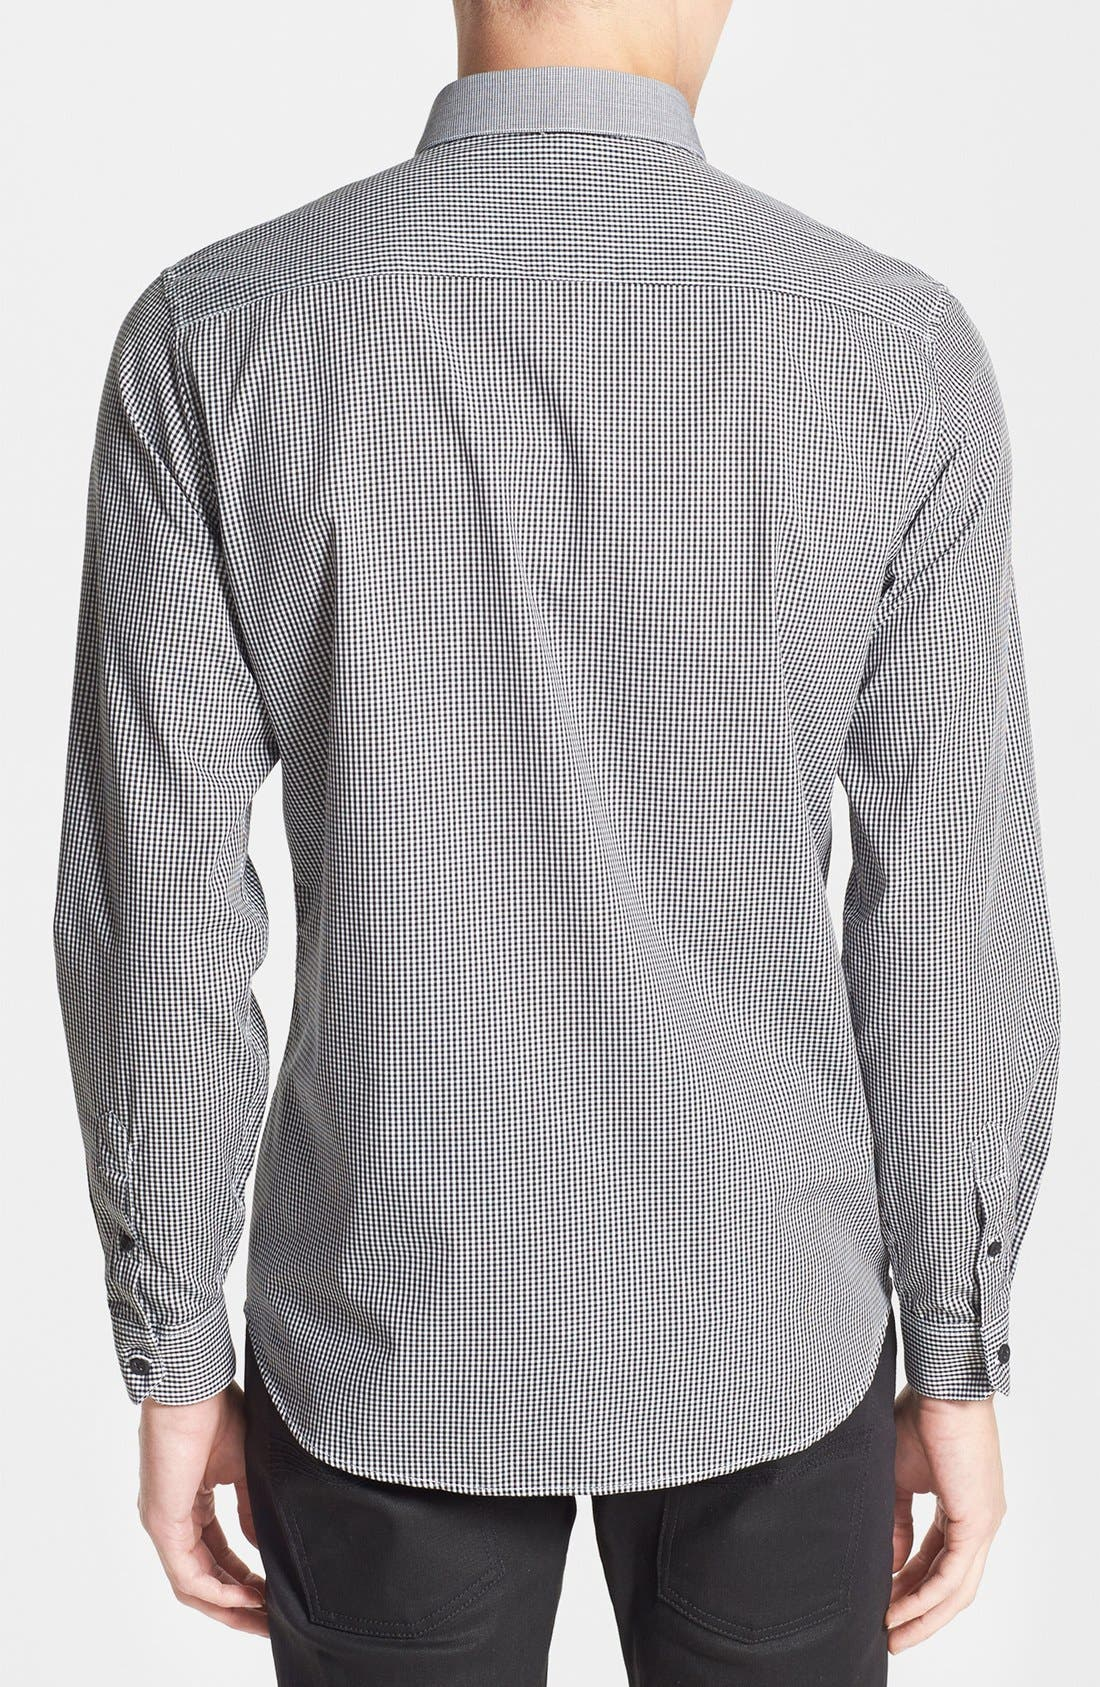 Alternate Image 2  - Topman Slim Fit Mixed Gingham Dress Shirt